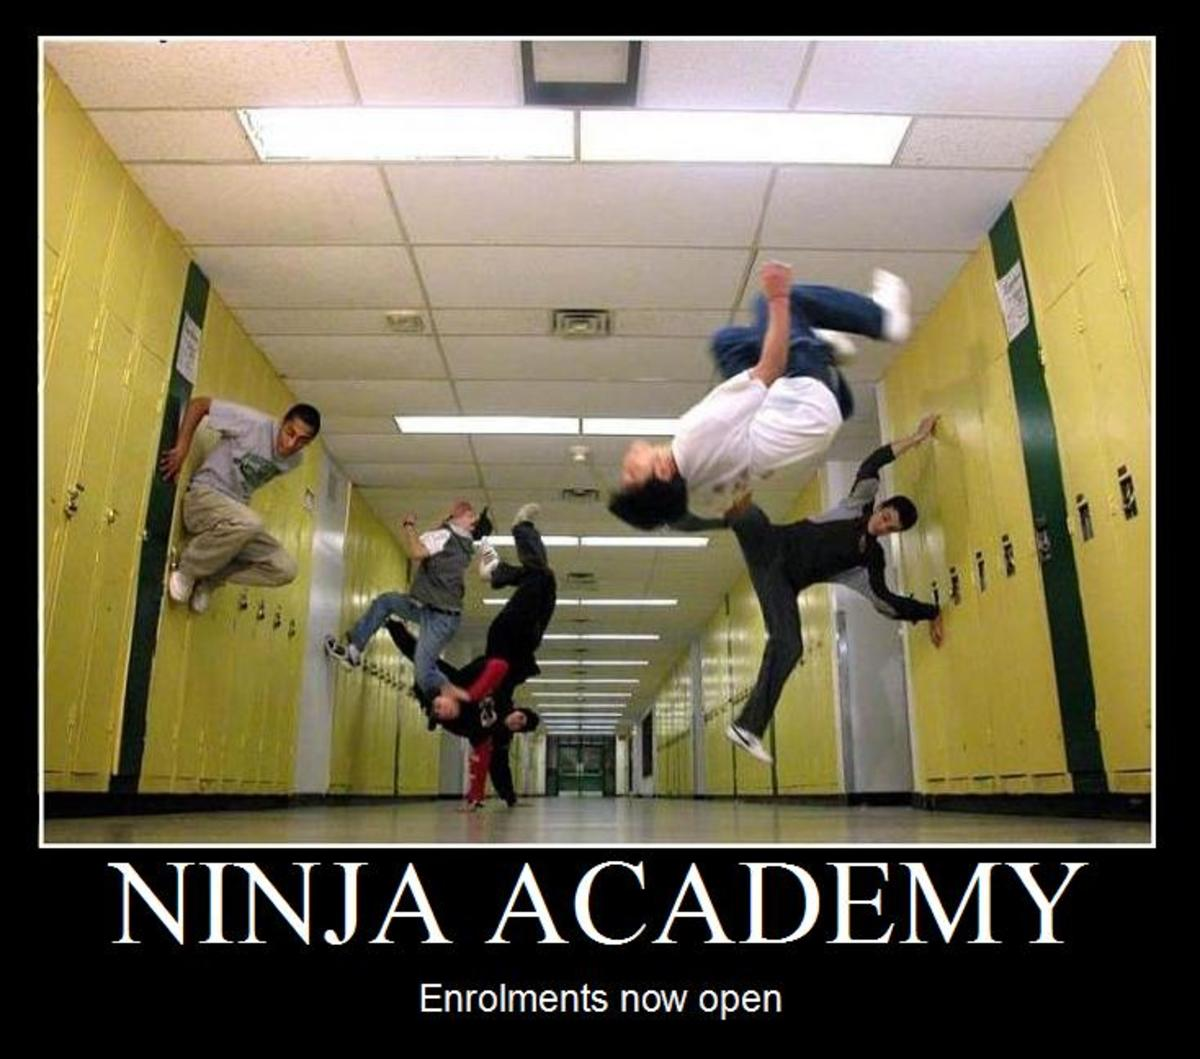 Ninja Academy - Enrollment Now Open